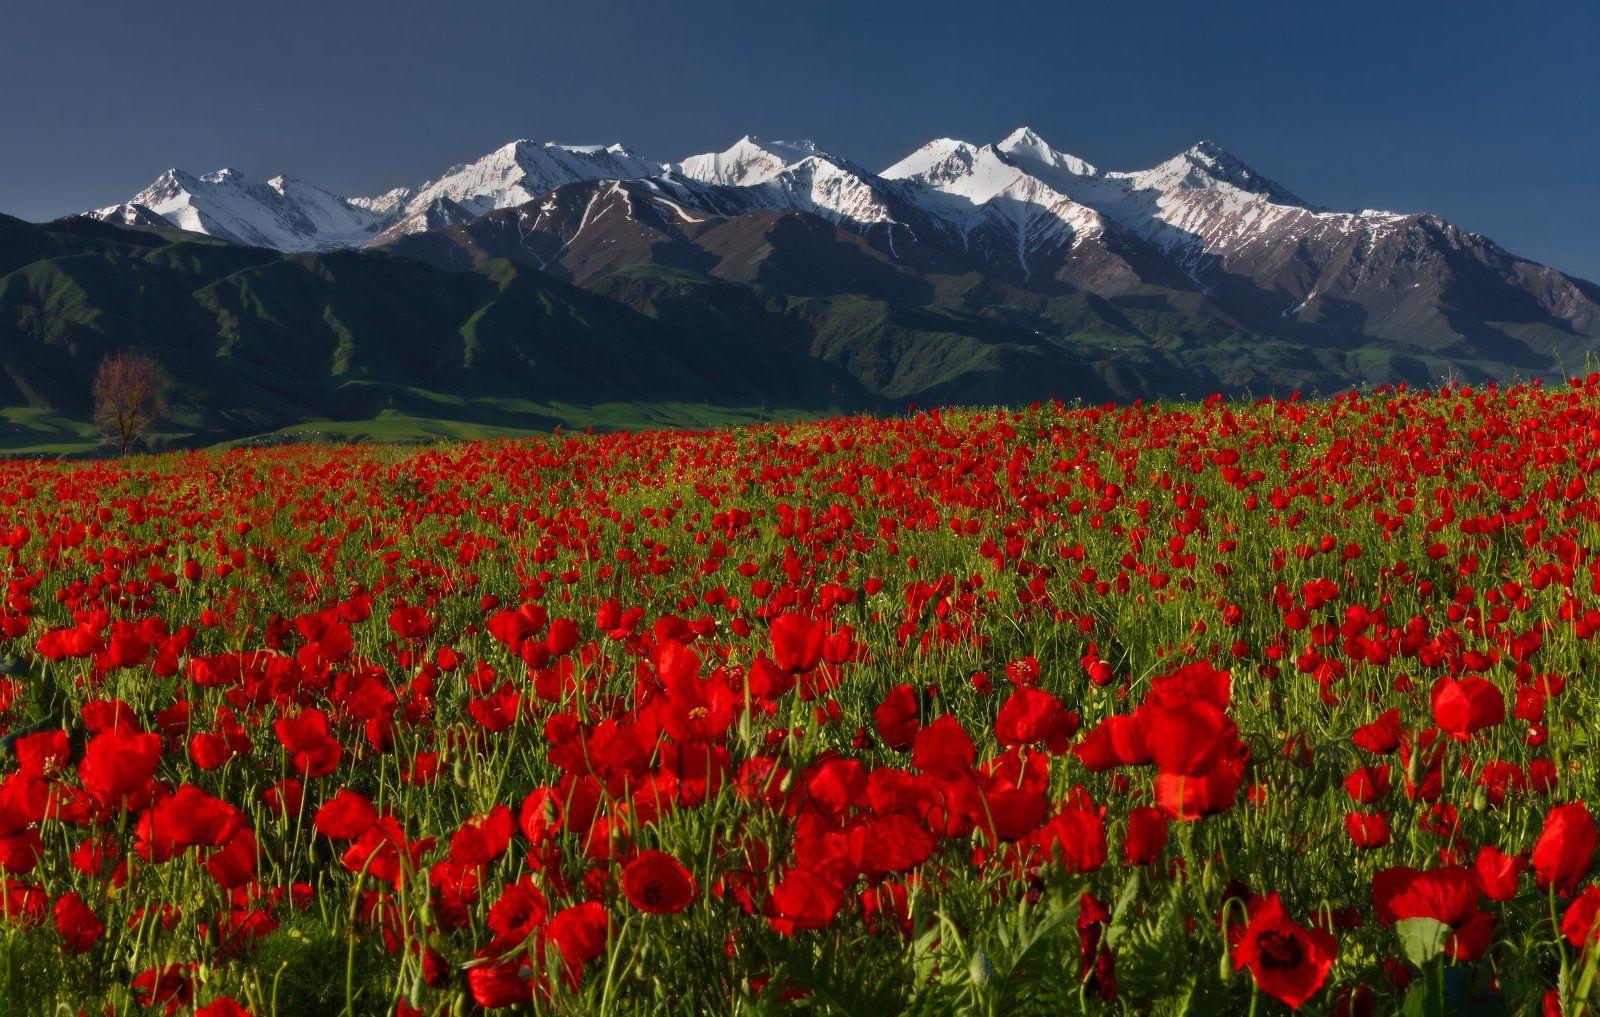 киргизия, бишкек, маки, горы, t_berg, Михаил Трахтенберг ( t_berg )